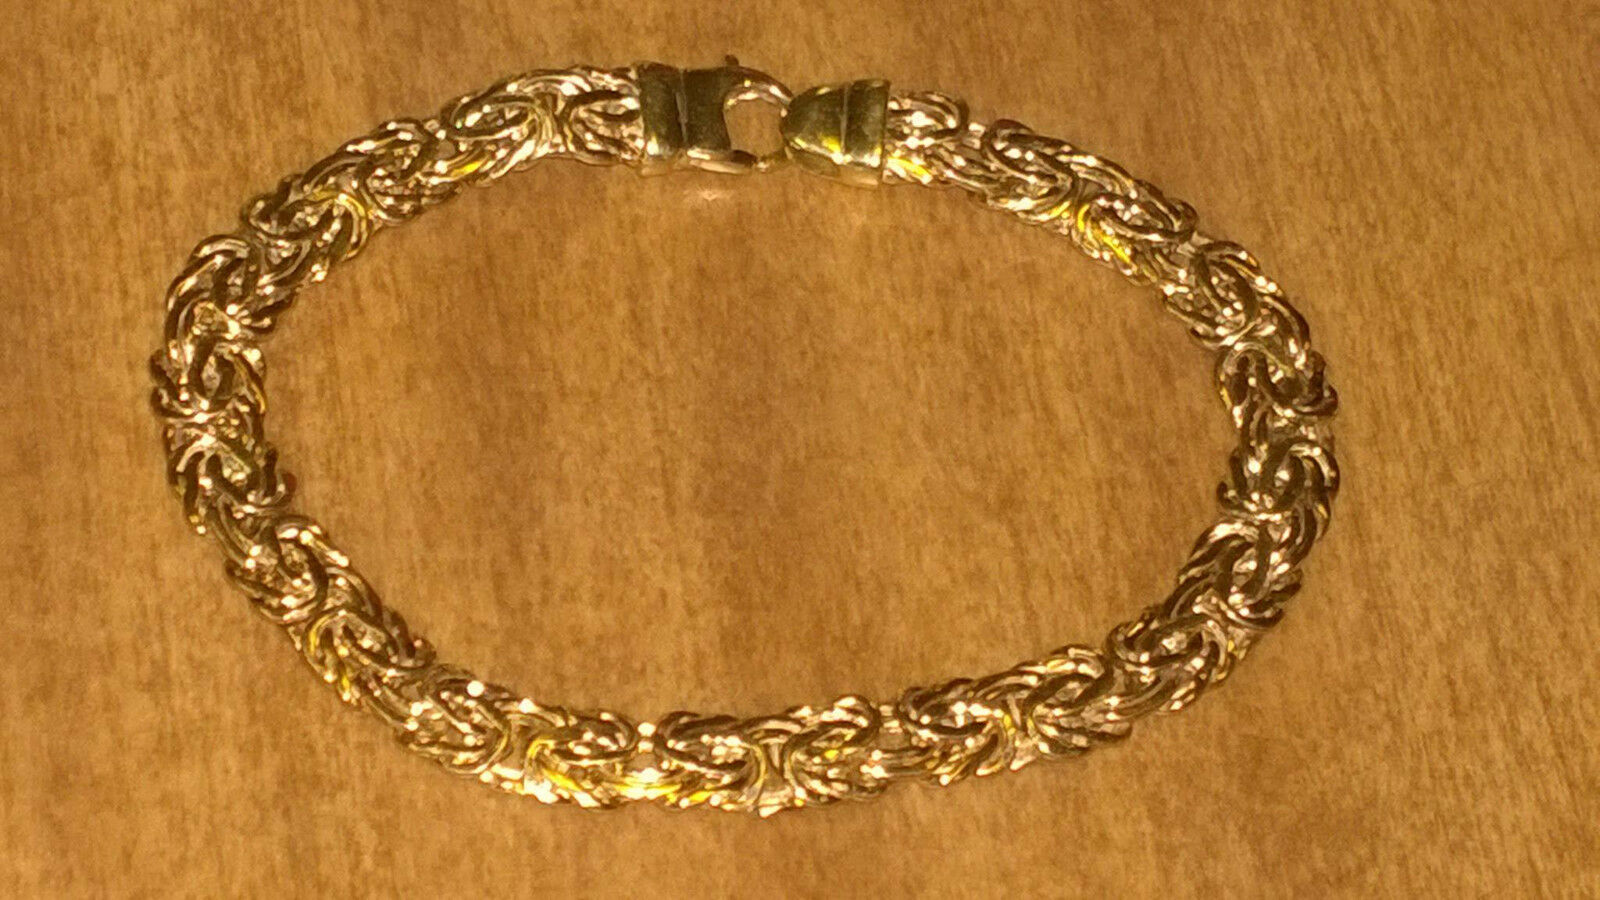 Benzatine Bracelet 14k yellow gold 7.25  Long  7.2 grams Marked RCI 14K